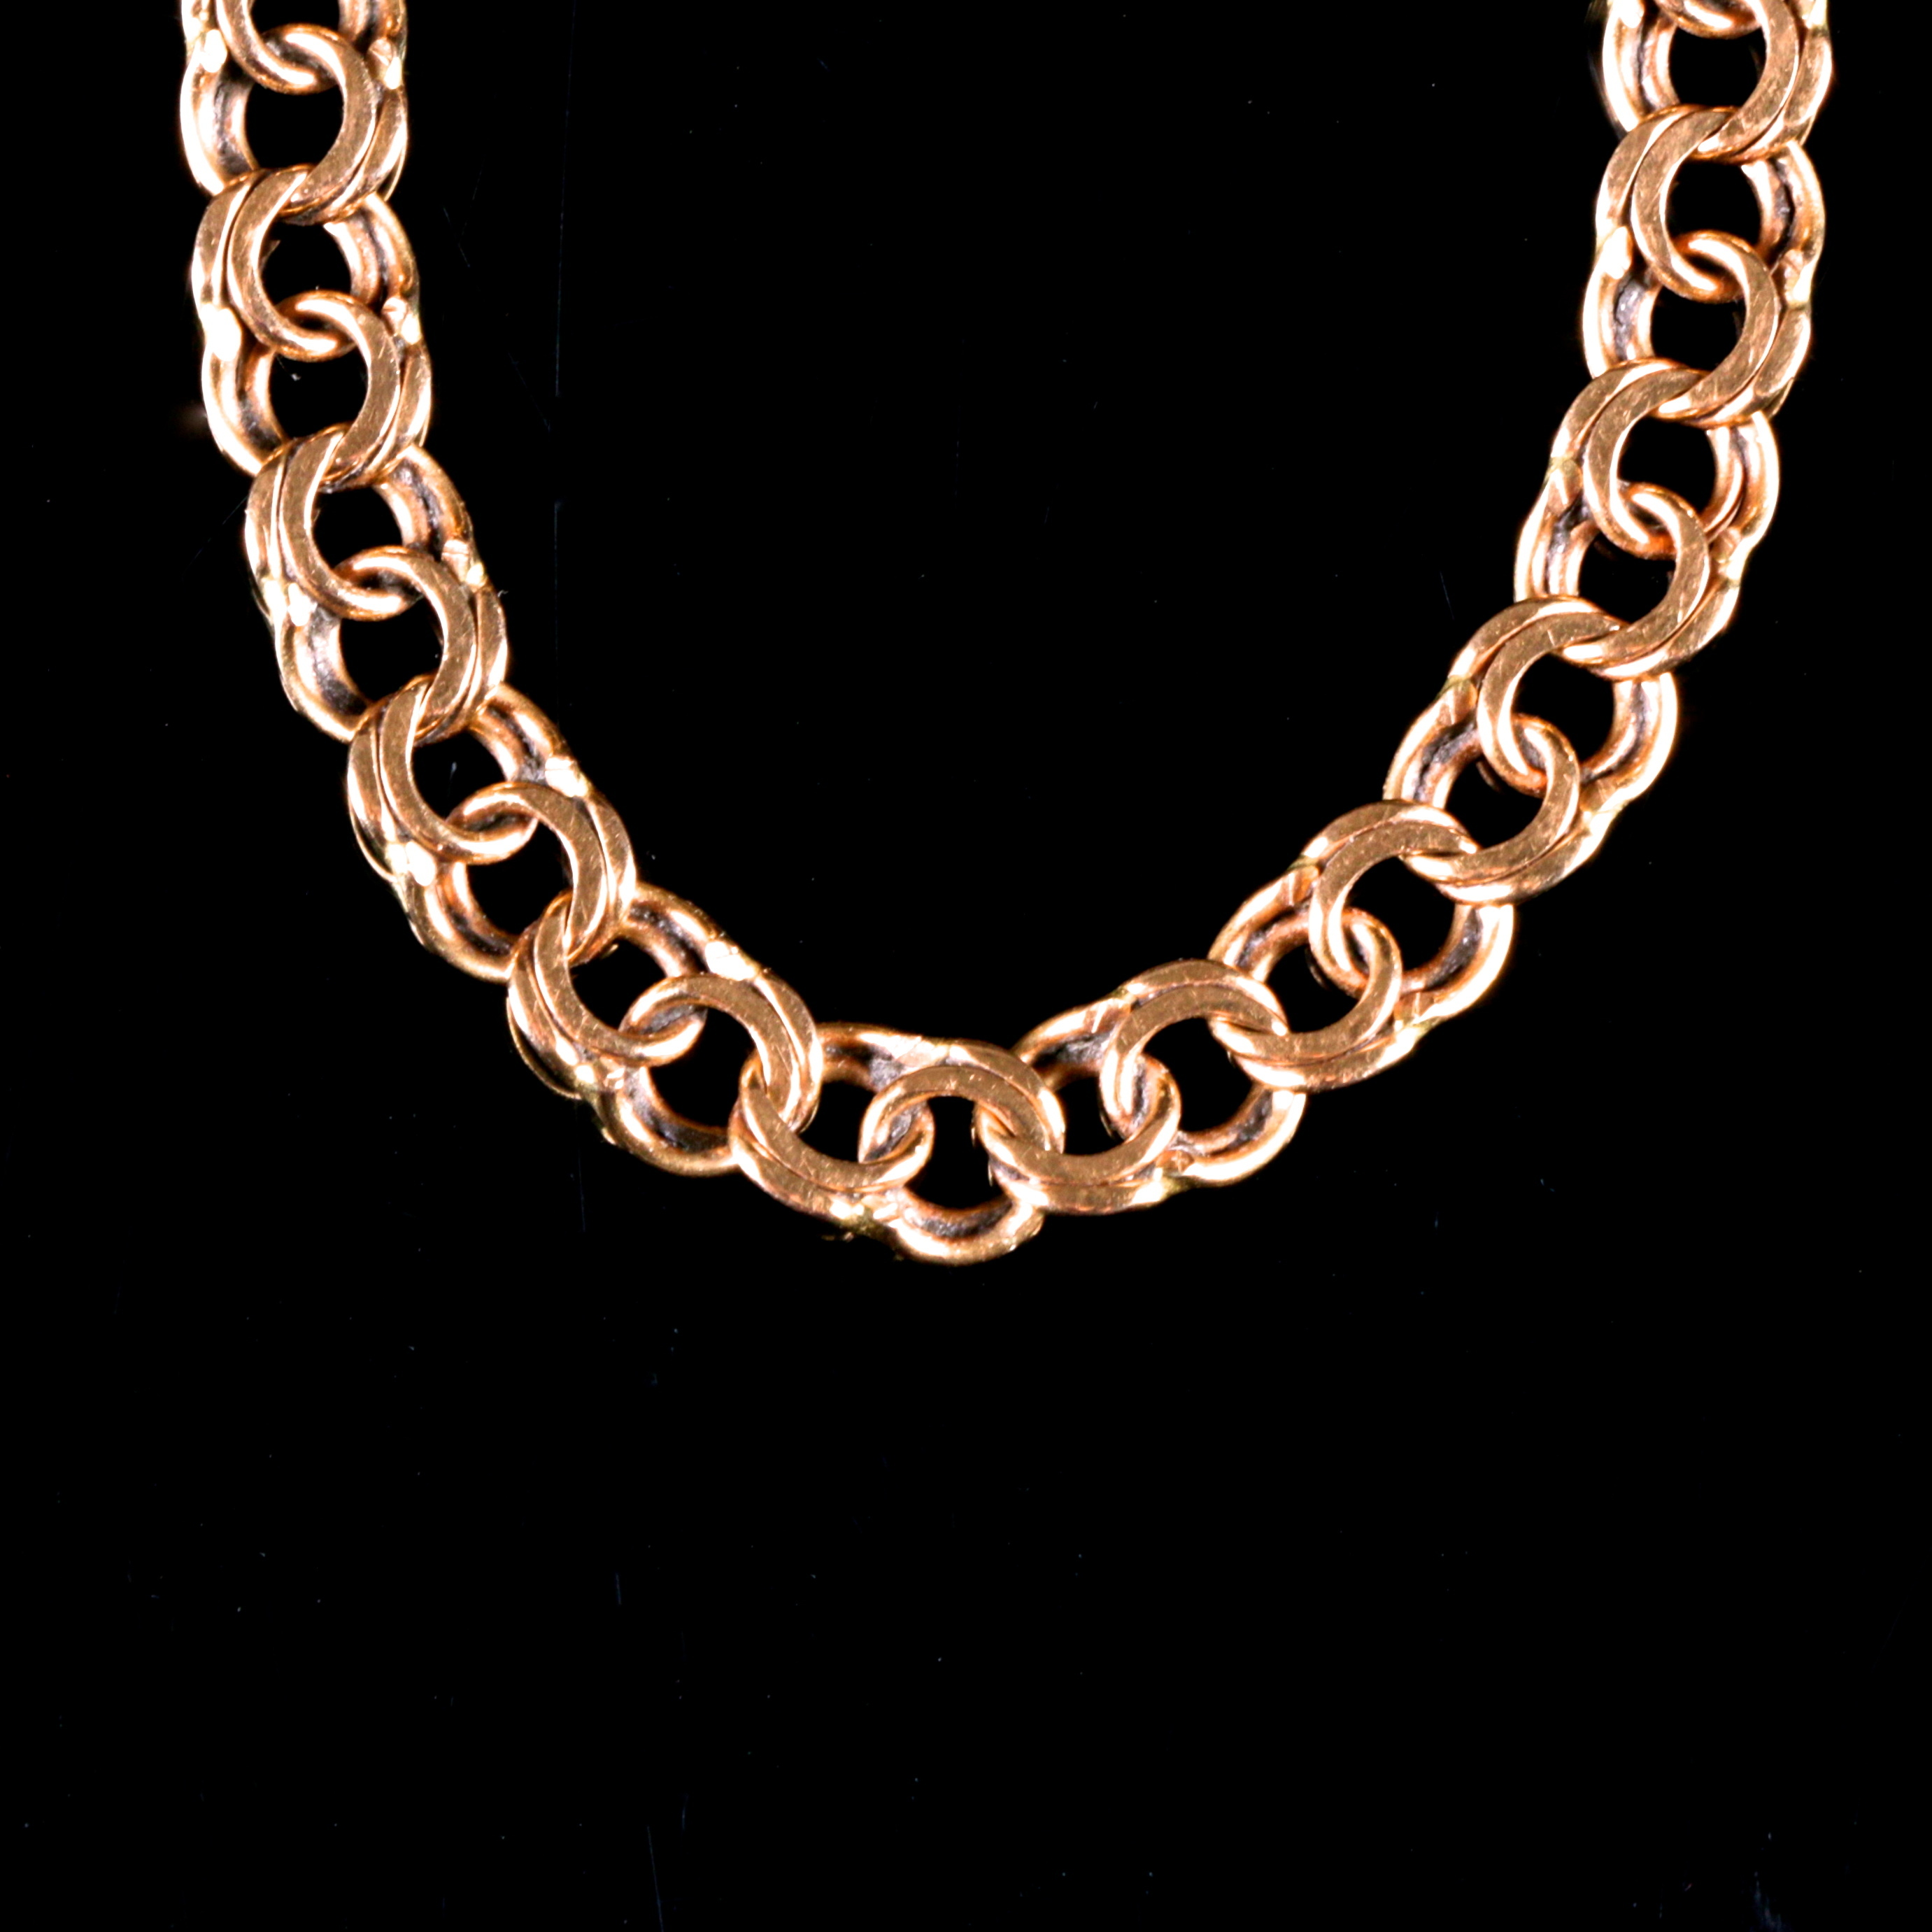 Smuk ARMBAND, 18k guld, bismarck, Guldfynd, 1900-tal. Jewellery CP-06